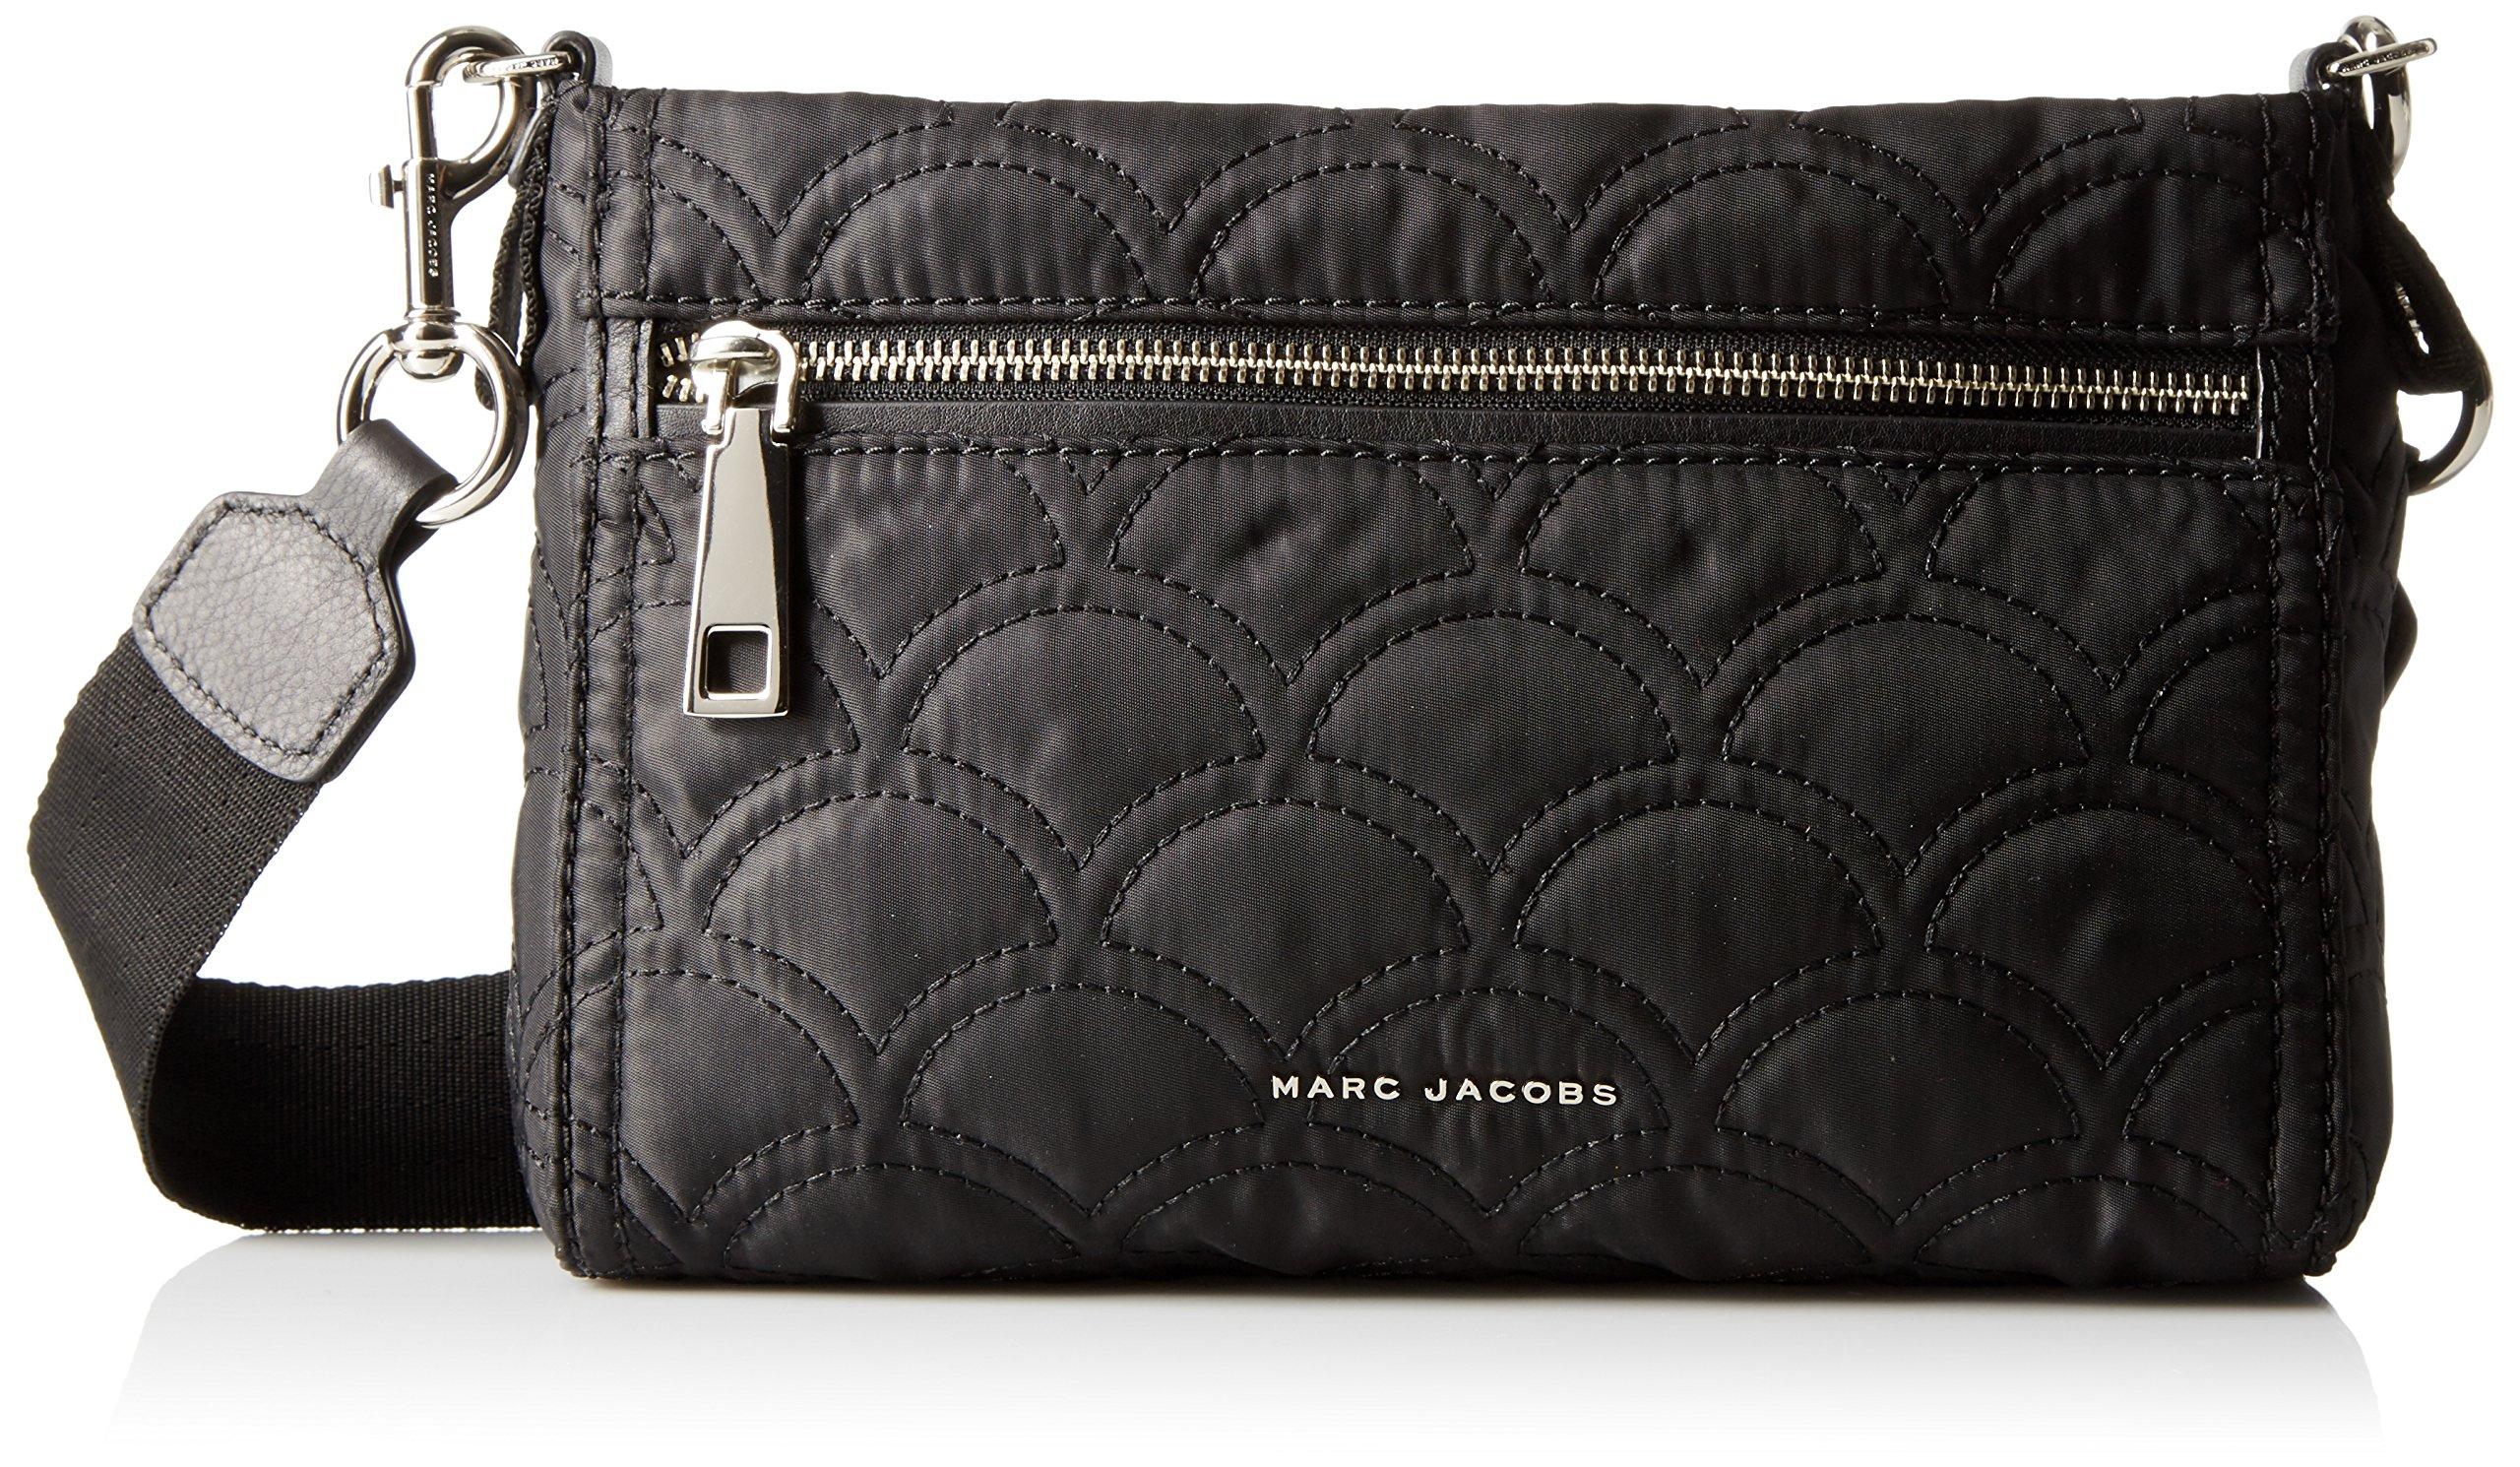 Marc Jacobs Easy Matelasse Crossbody, Black